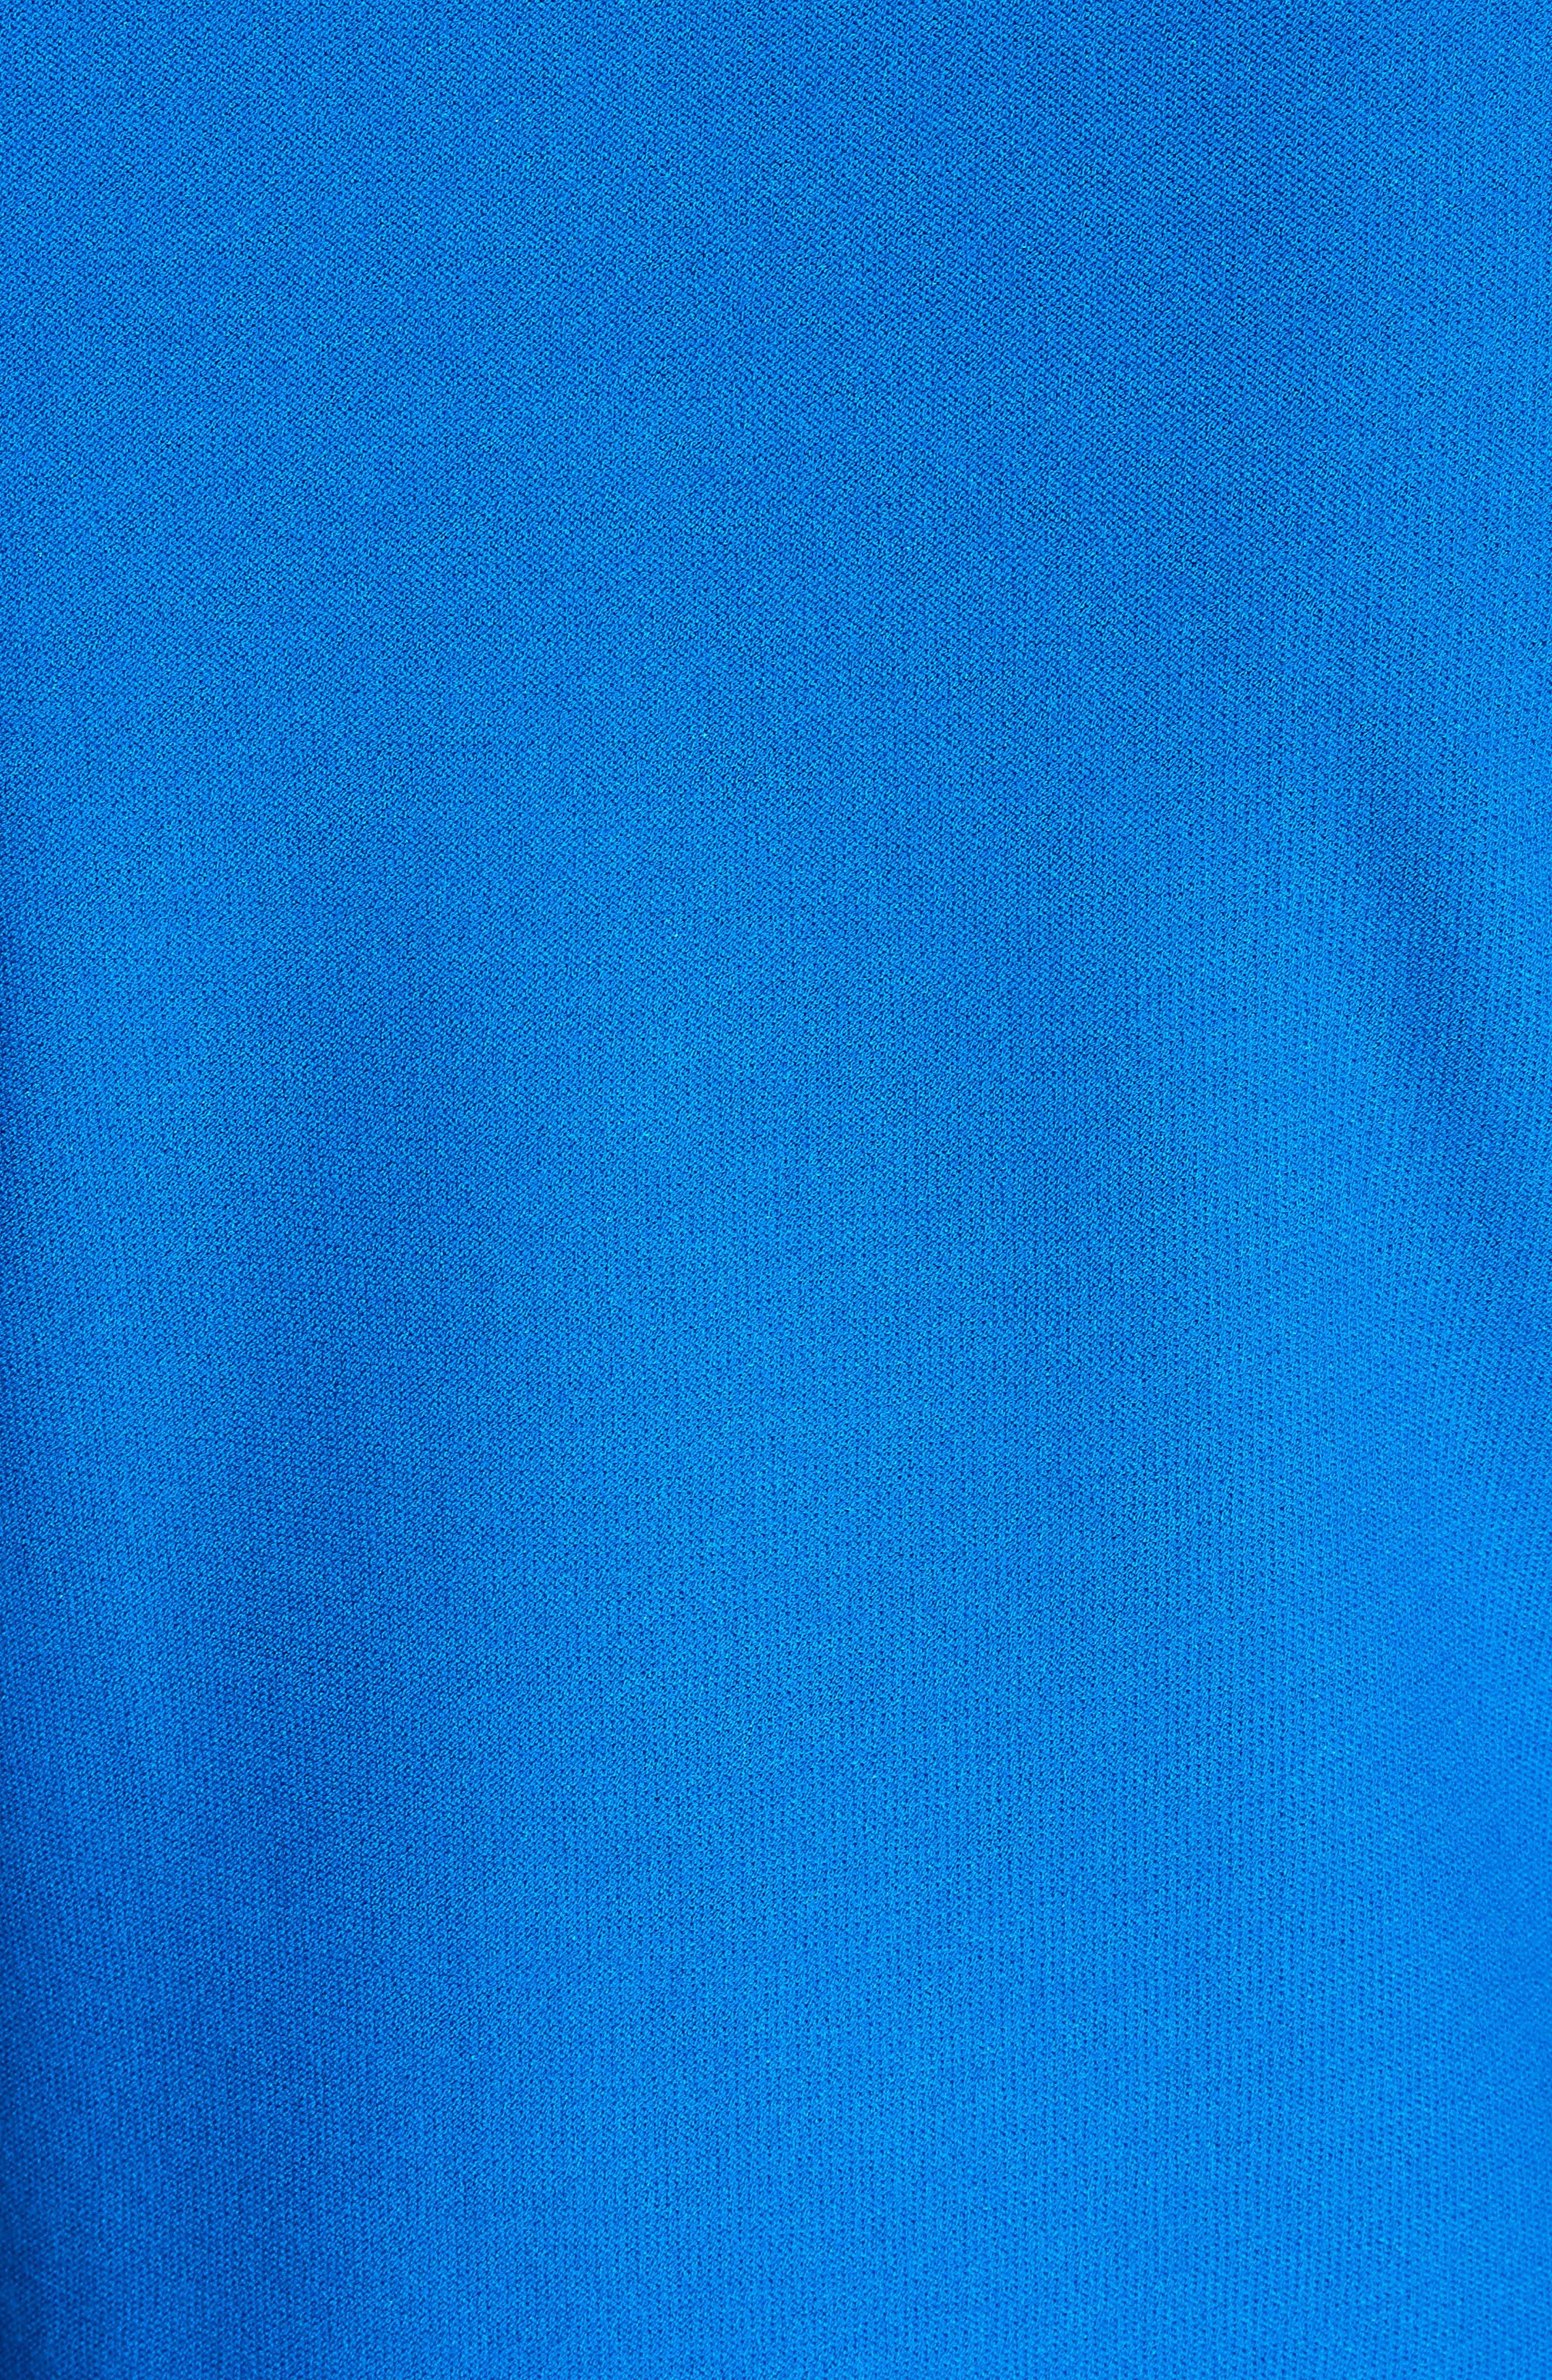 Stripe Intarsia Knit Cardigan,                             Alternate thumbnail 7, color,                             Jaya Blue/ Bianco